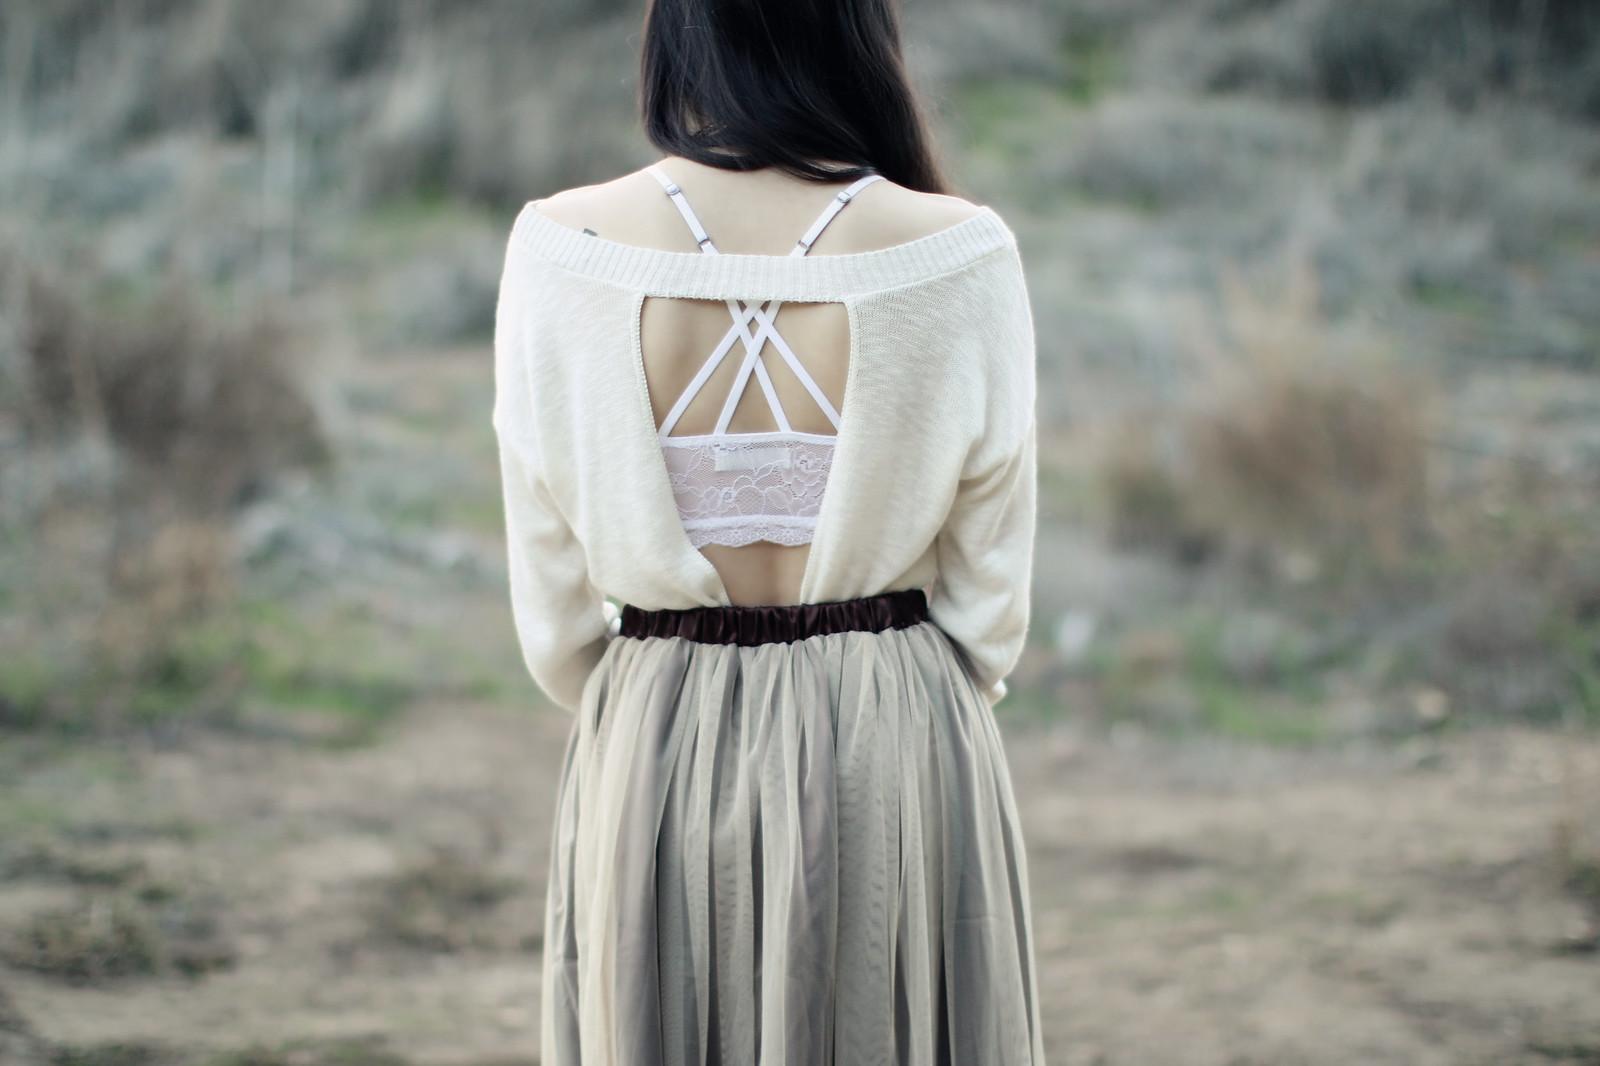 1349-ootd-fashion-chiffon-lace-skirt-openback-sweater-express-holiday2016-lookbook-korean-fashion-elizabeeetht-clothestoyouuu